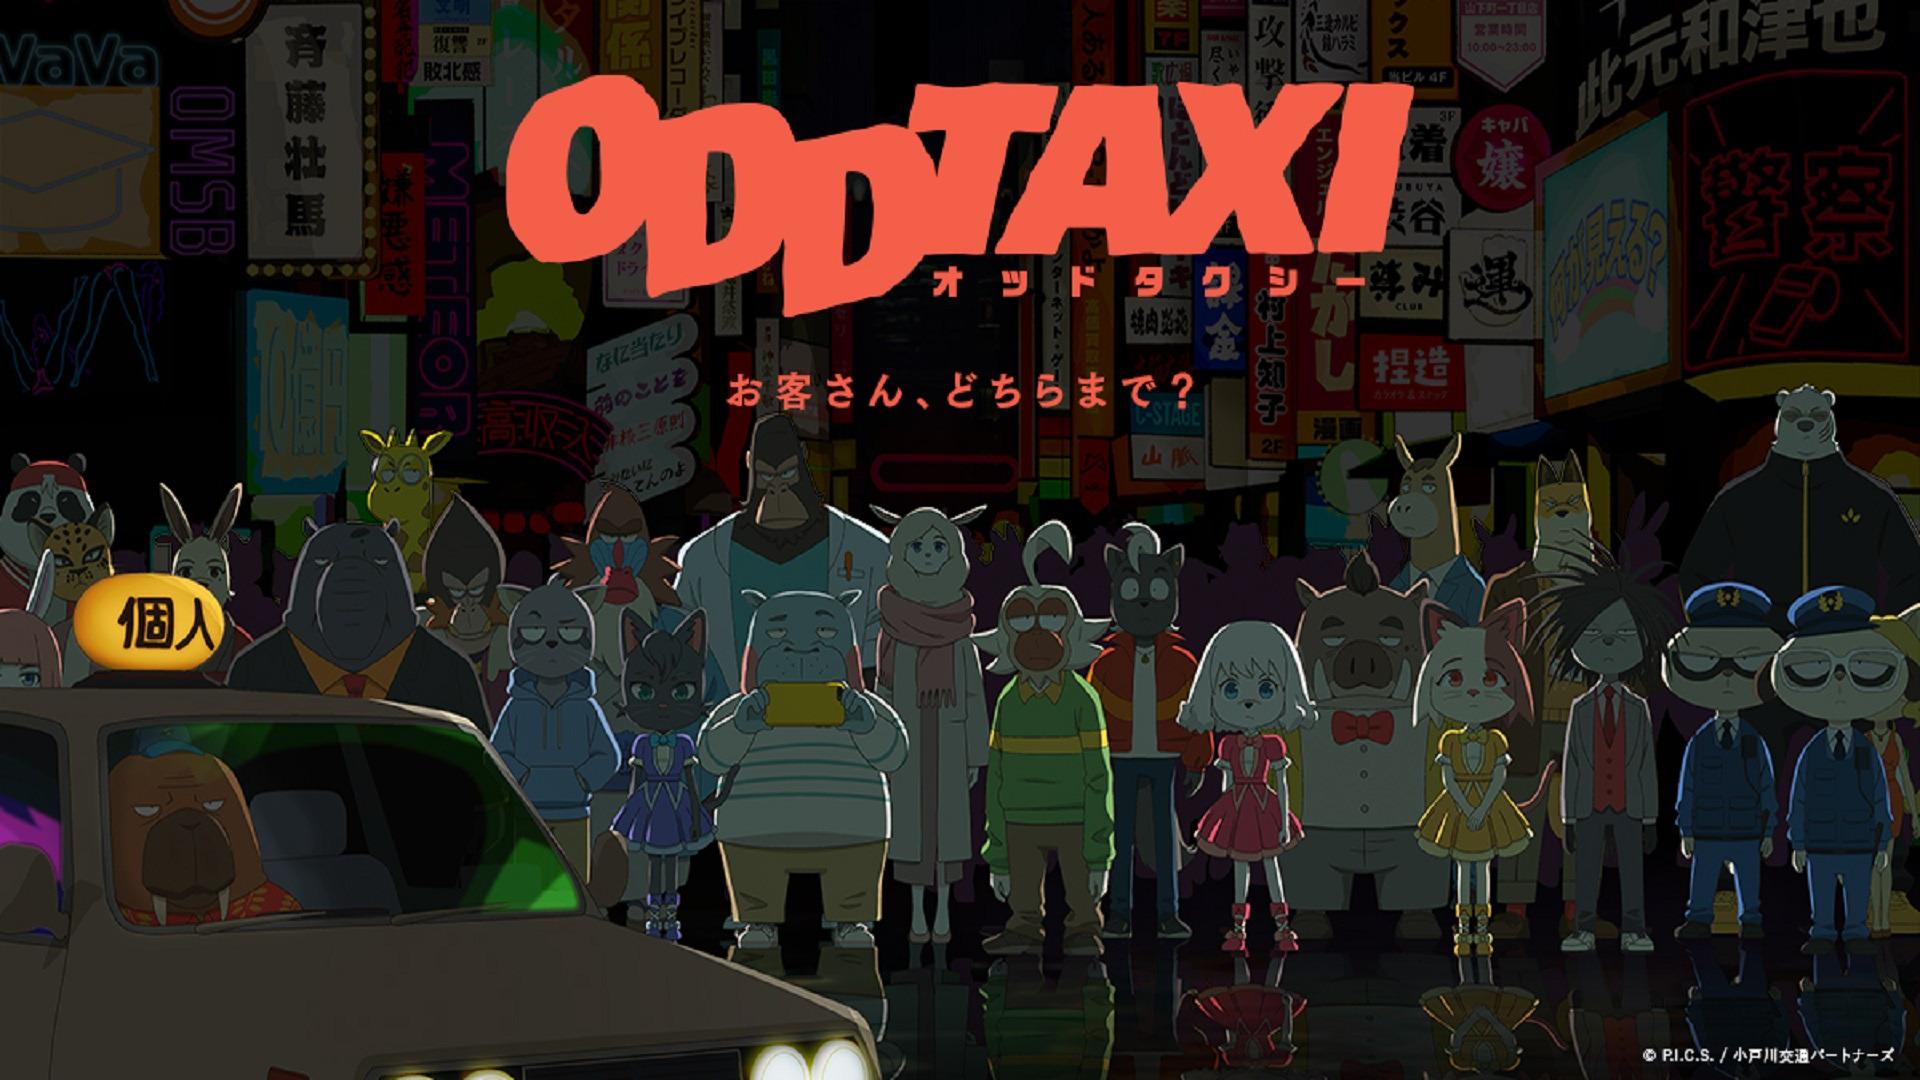 Show Odd Taxi